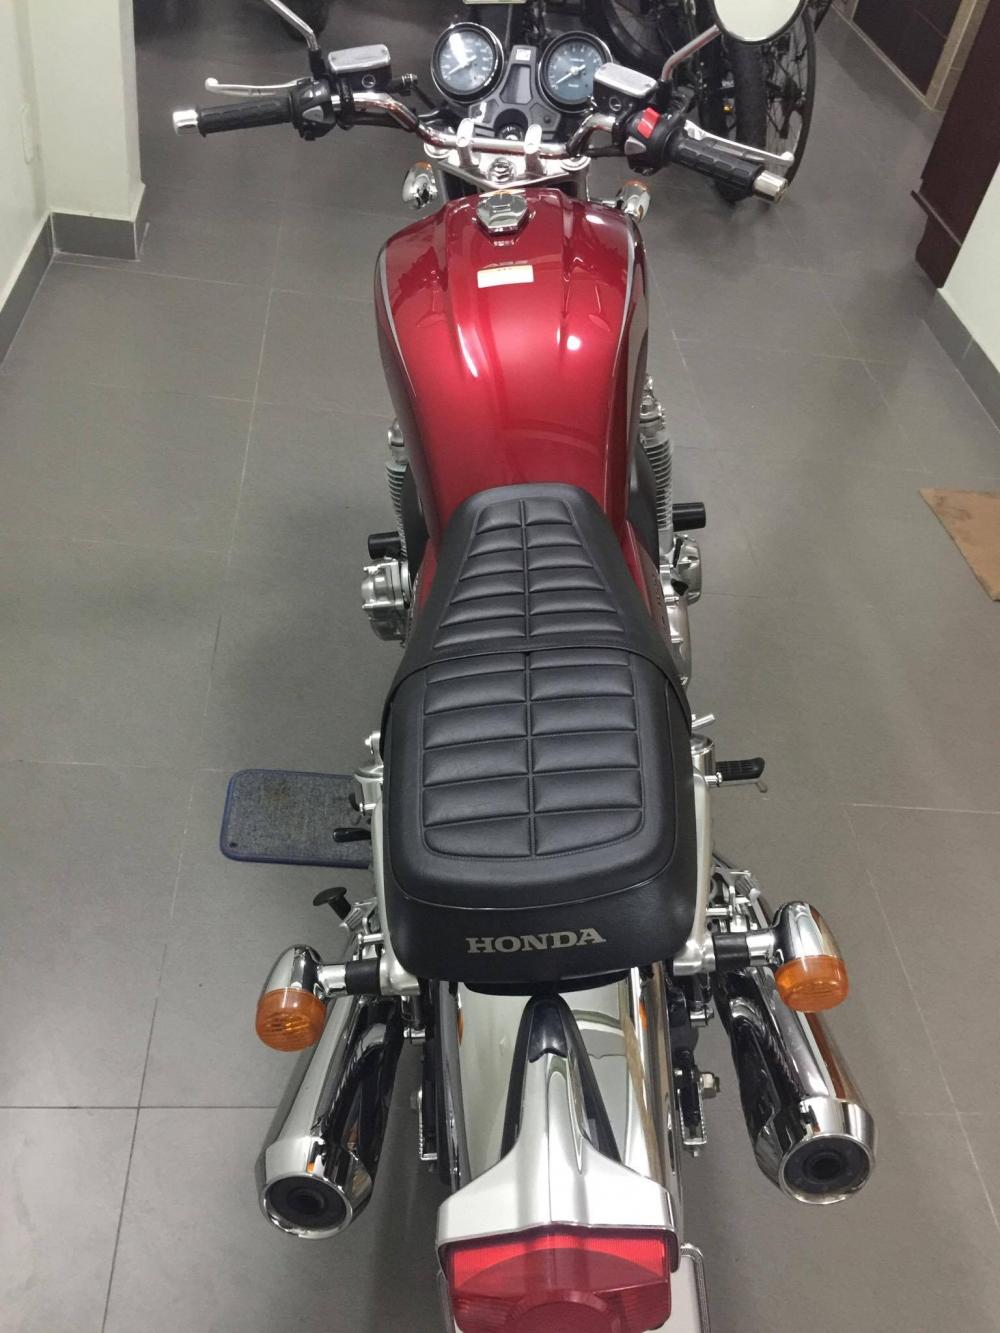 Ban Honda CB 1100 EX 2015 HQCN - 3